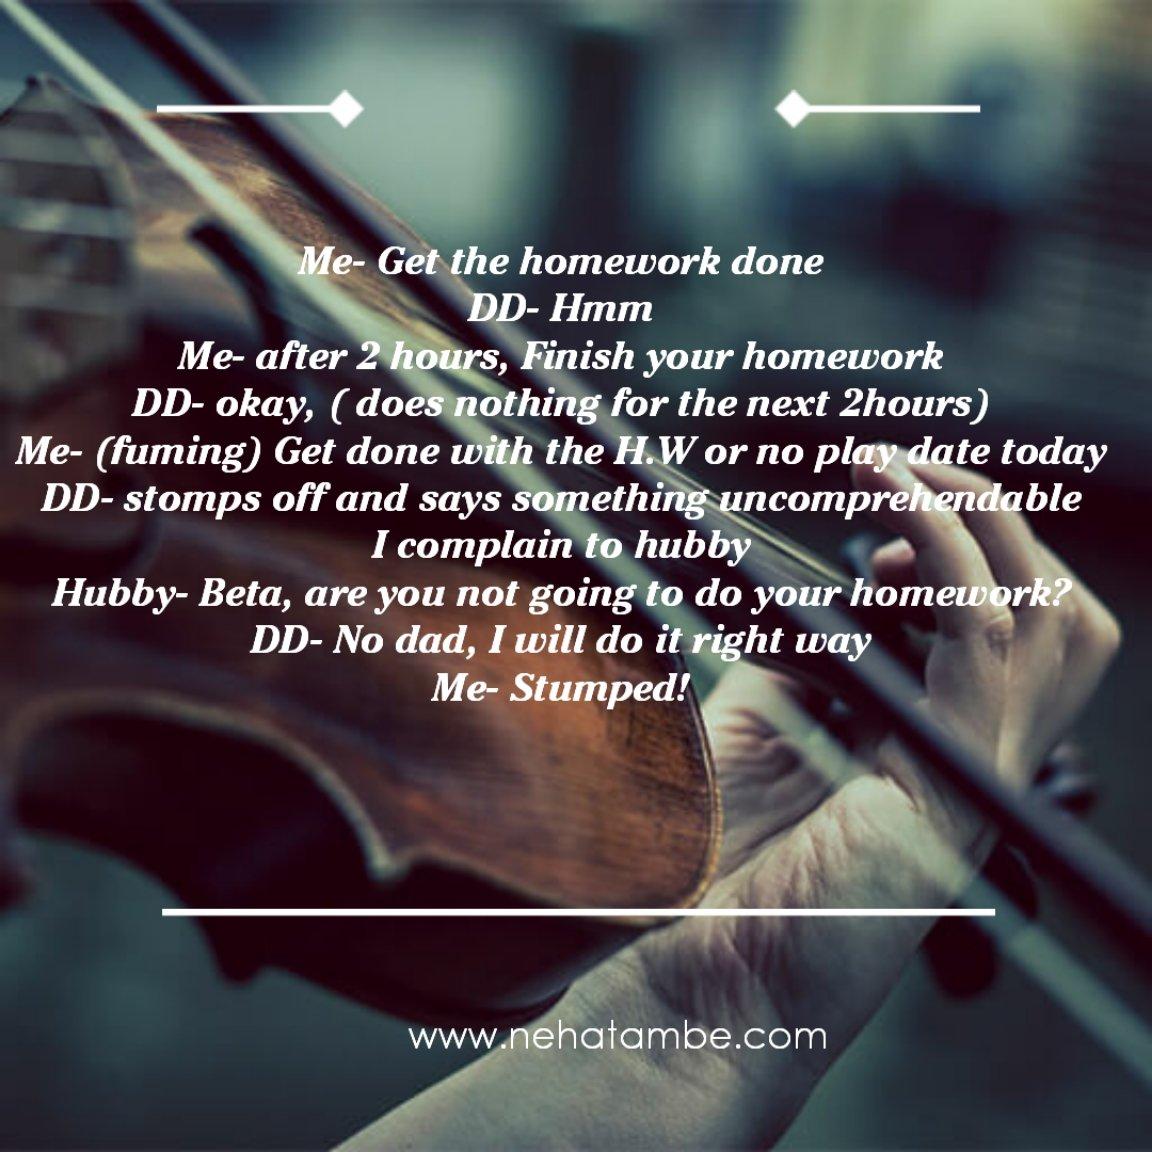 @gayatri_gadre @romspeaks @foodietweeter @Ishieta @Anupriya_Guptaa @sujitrukhsat @Mayuri6 @twinklingtina @NatsCosmicrain #Tiniature #Tinystory #tinystories #microstories #tinytales #amwriting #truestory #BeingAuthor https://t.co/f1FwJaQV7p